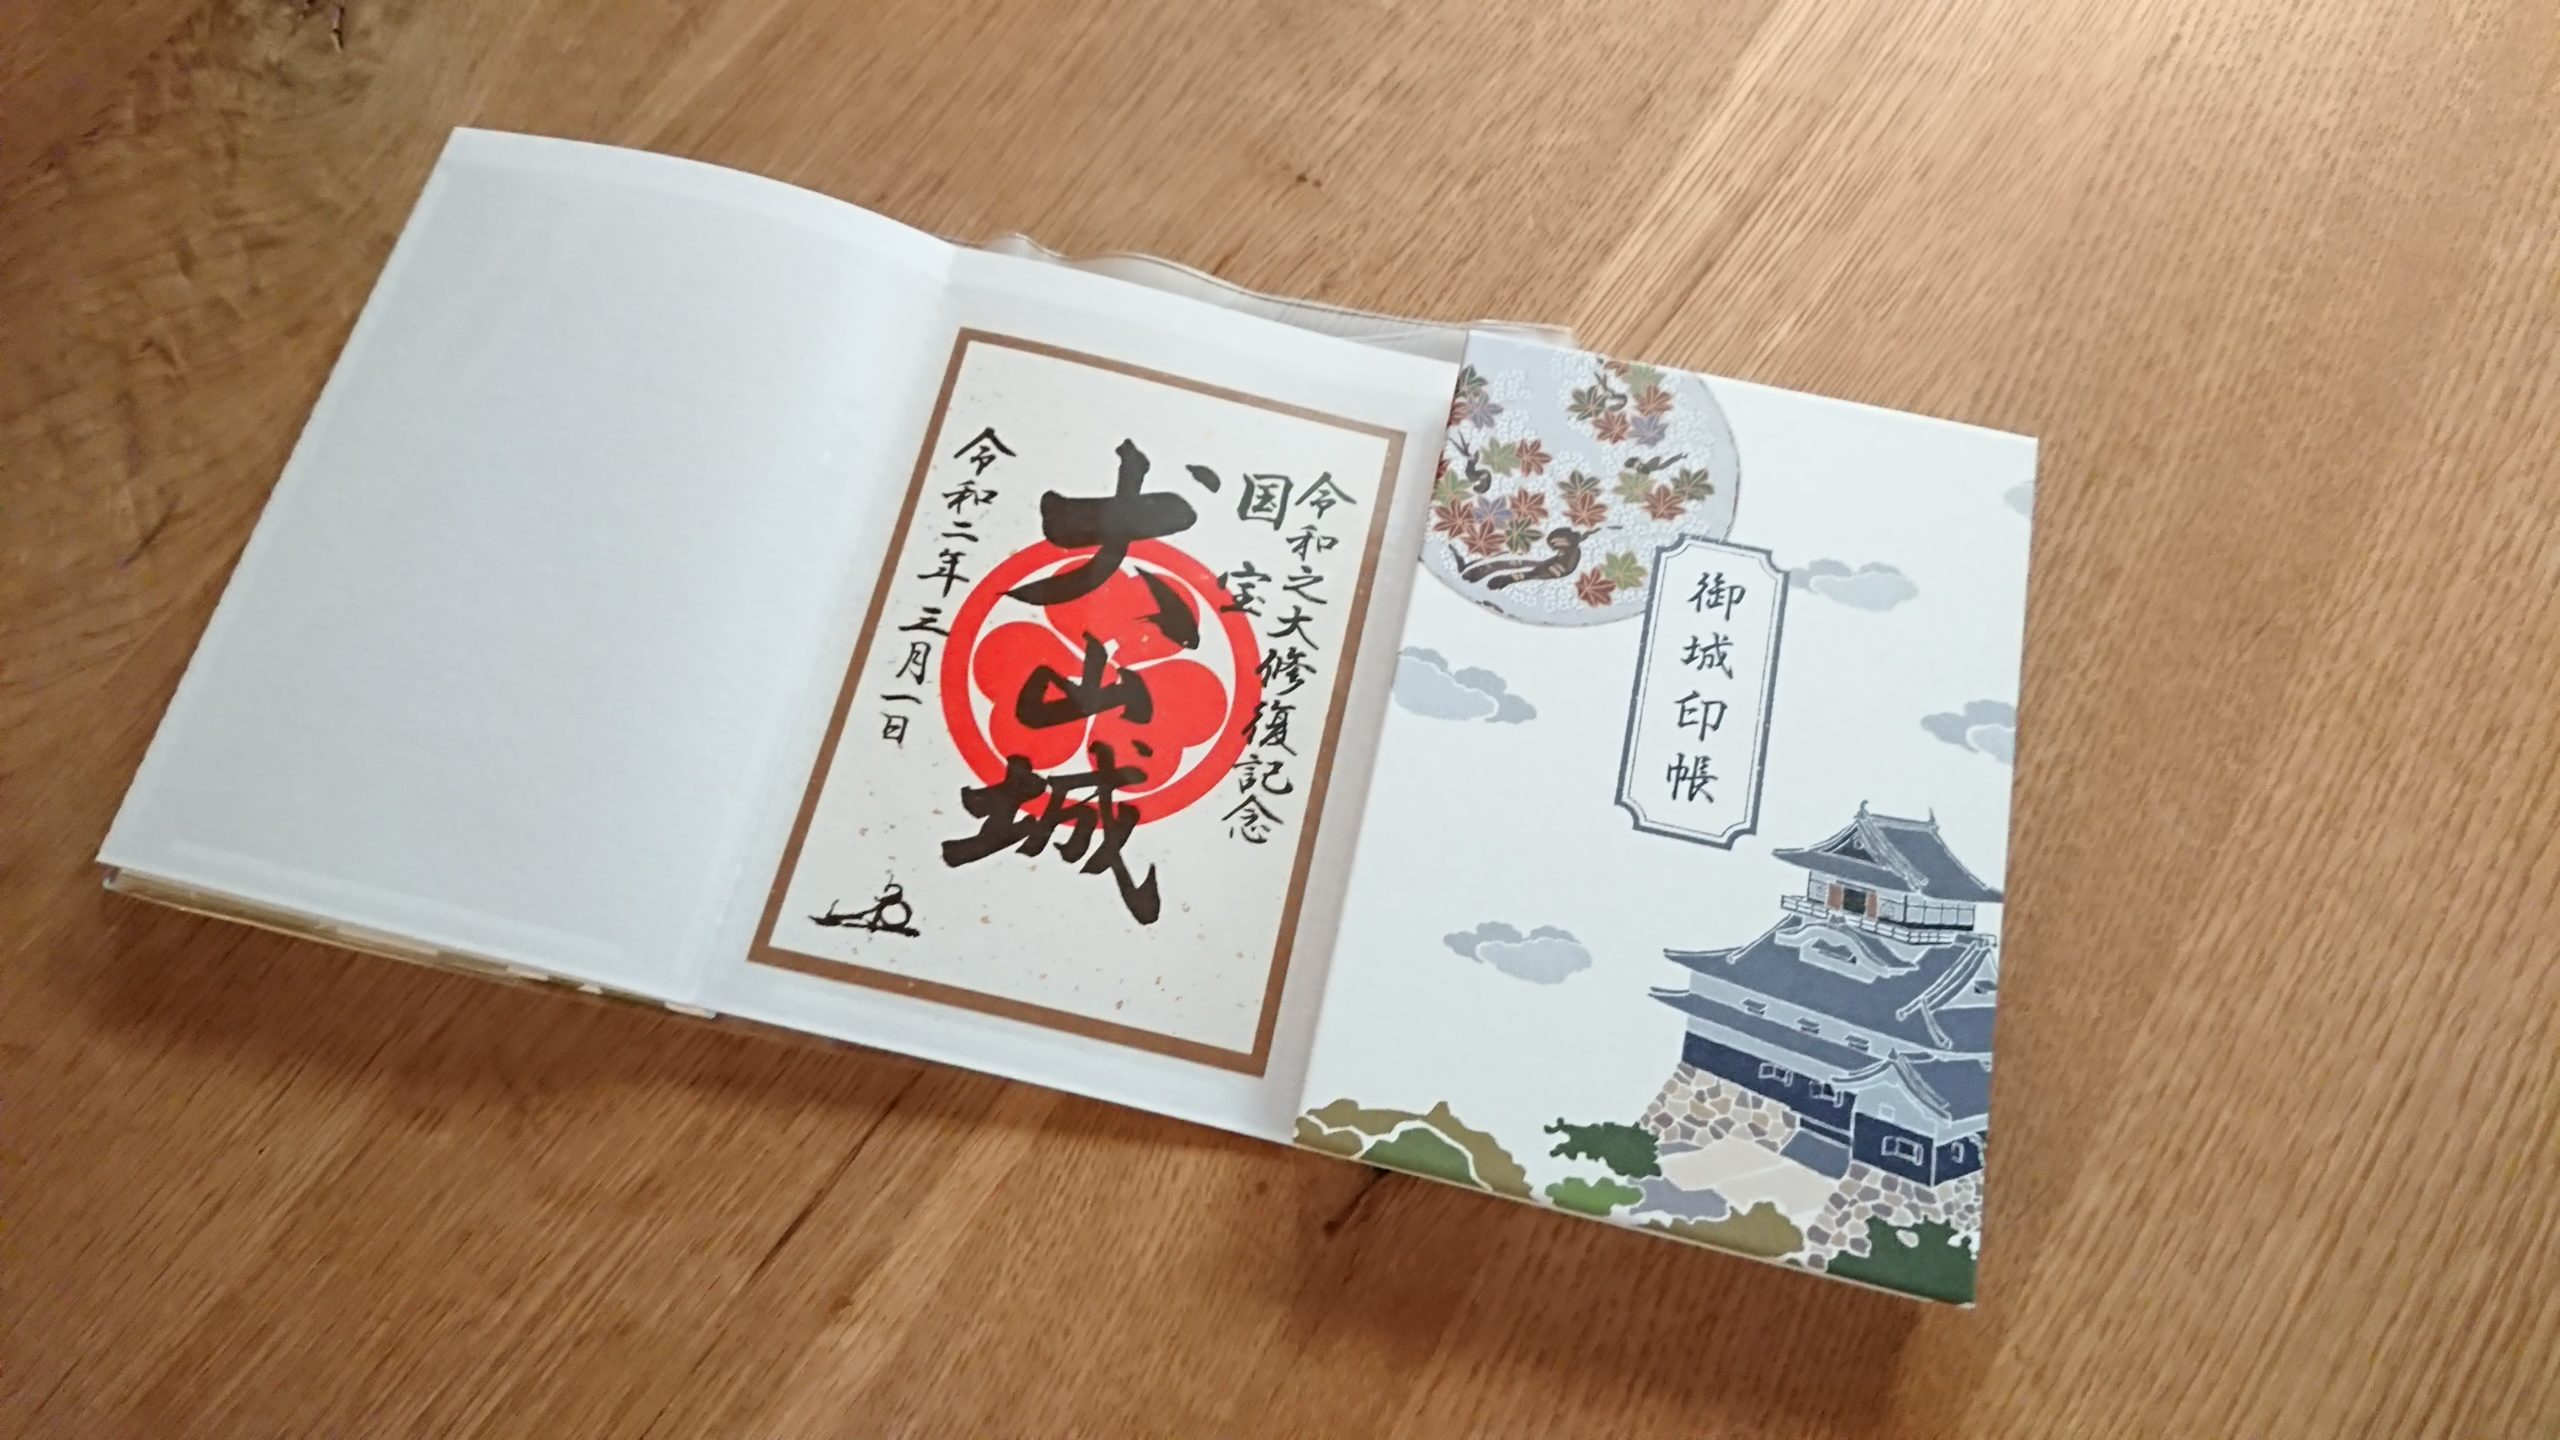 犬山城の御城印帳と犬山城の特別版御城印